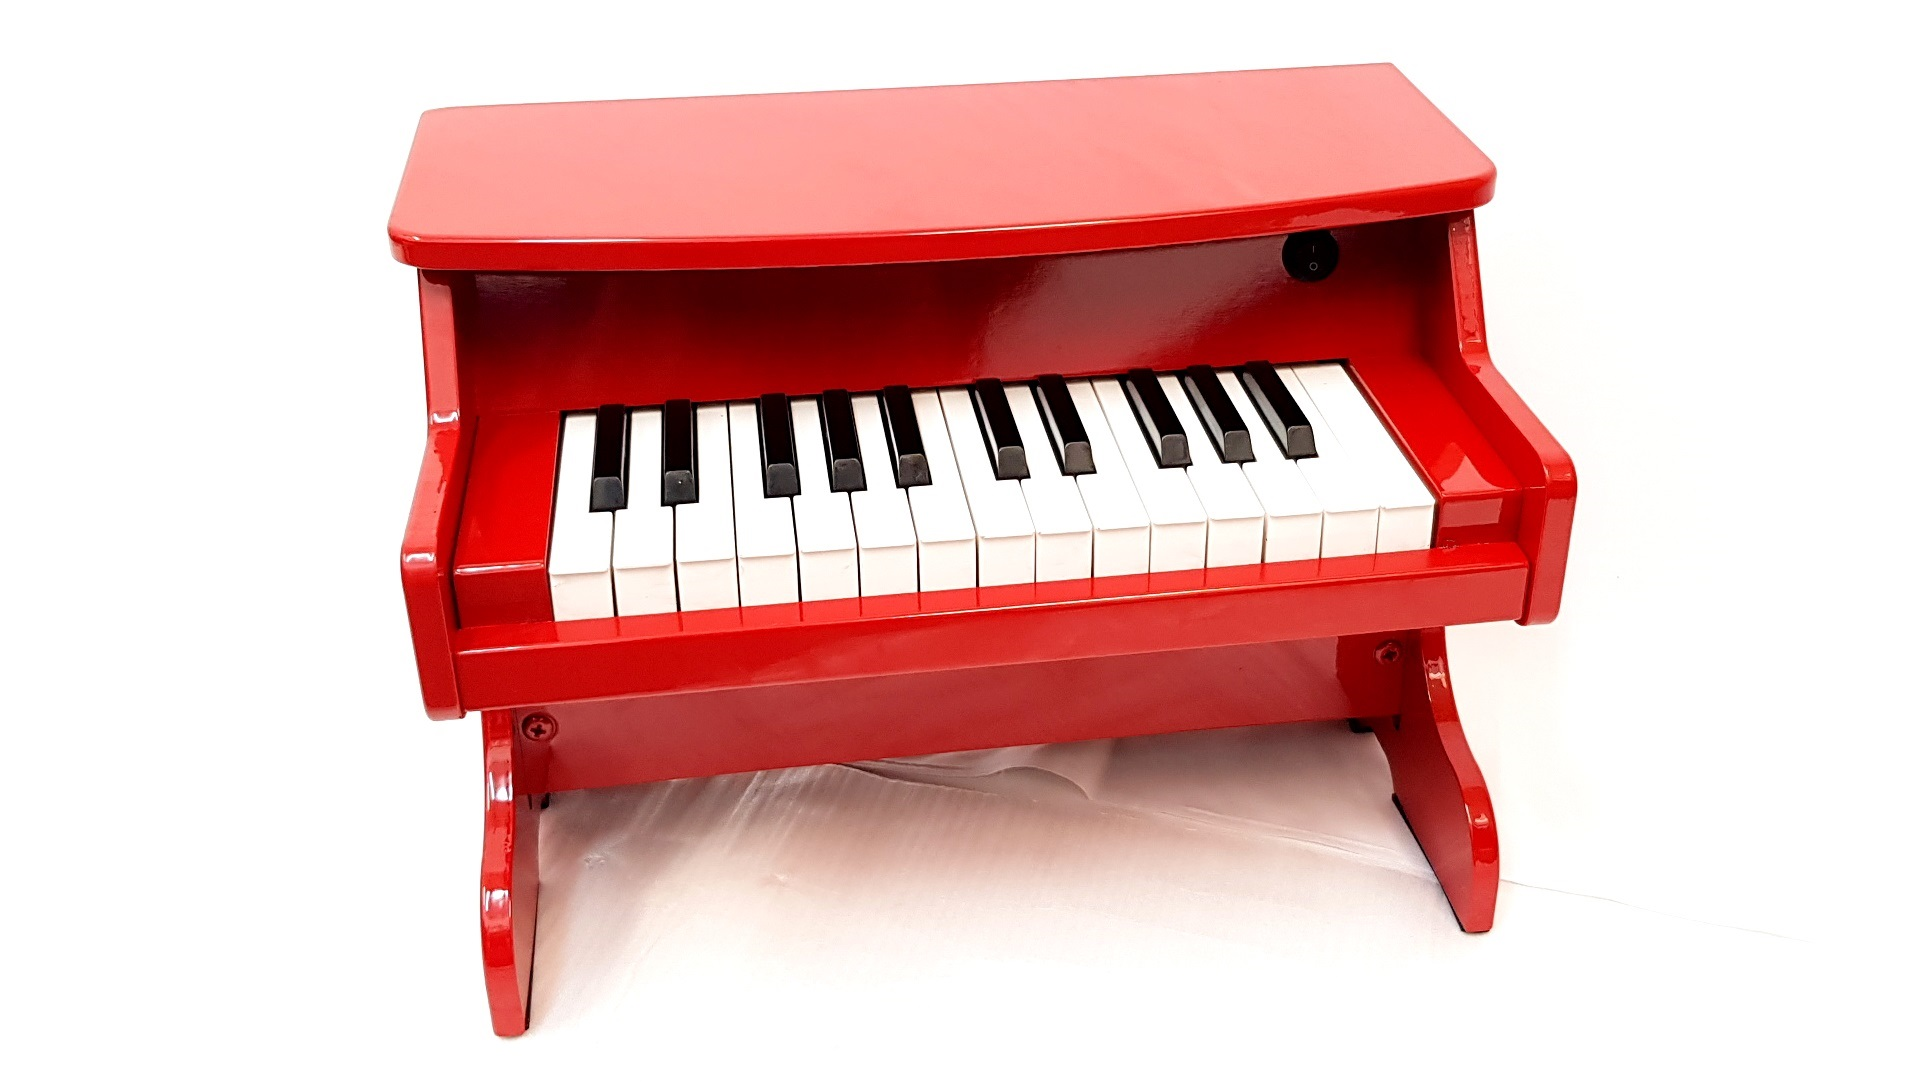 Digital Home Piano Advantages and Disadvantages